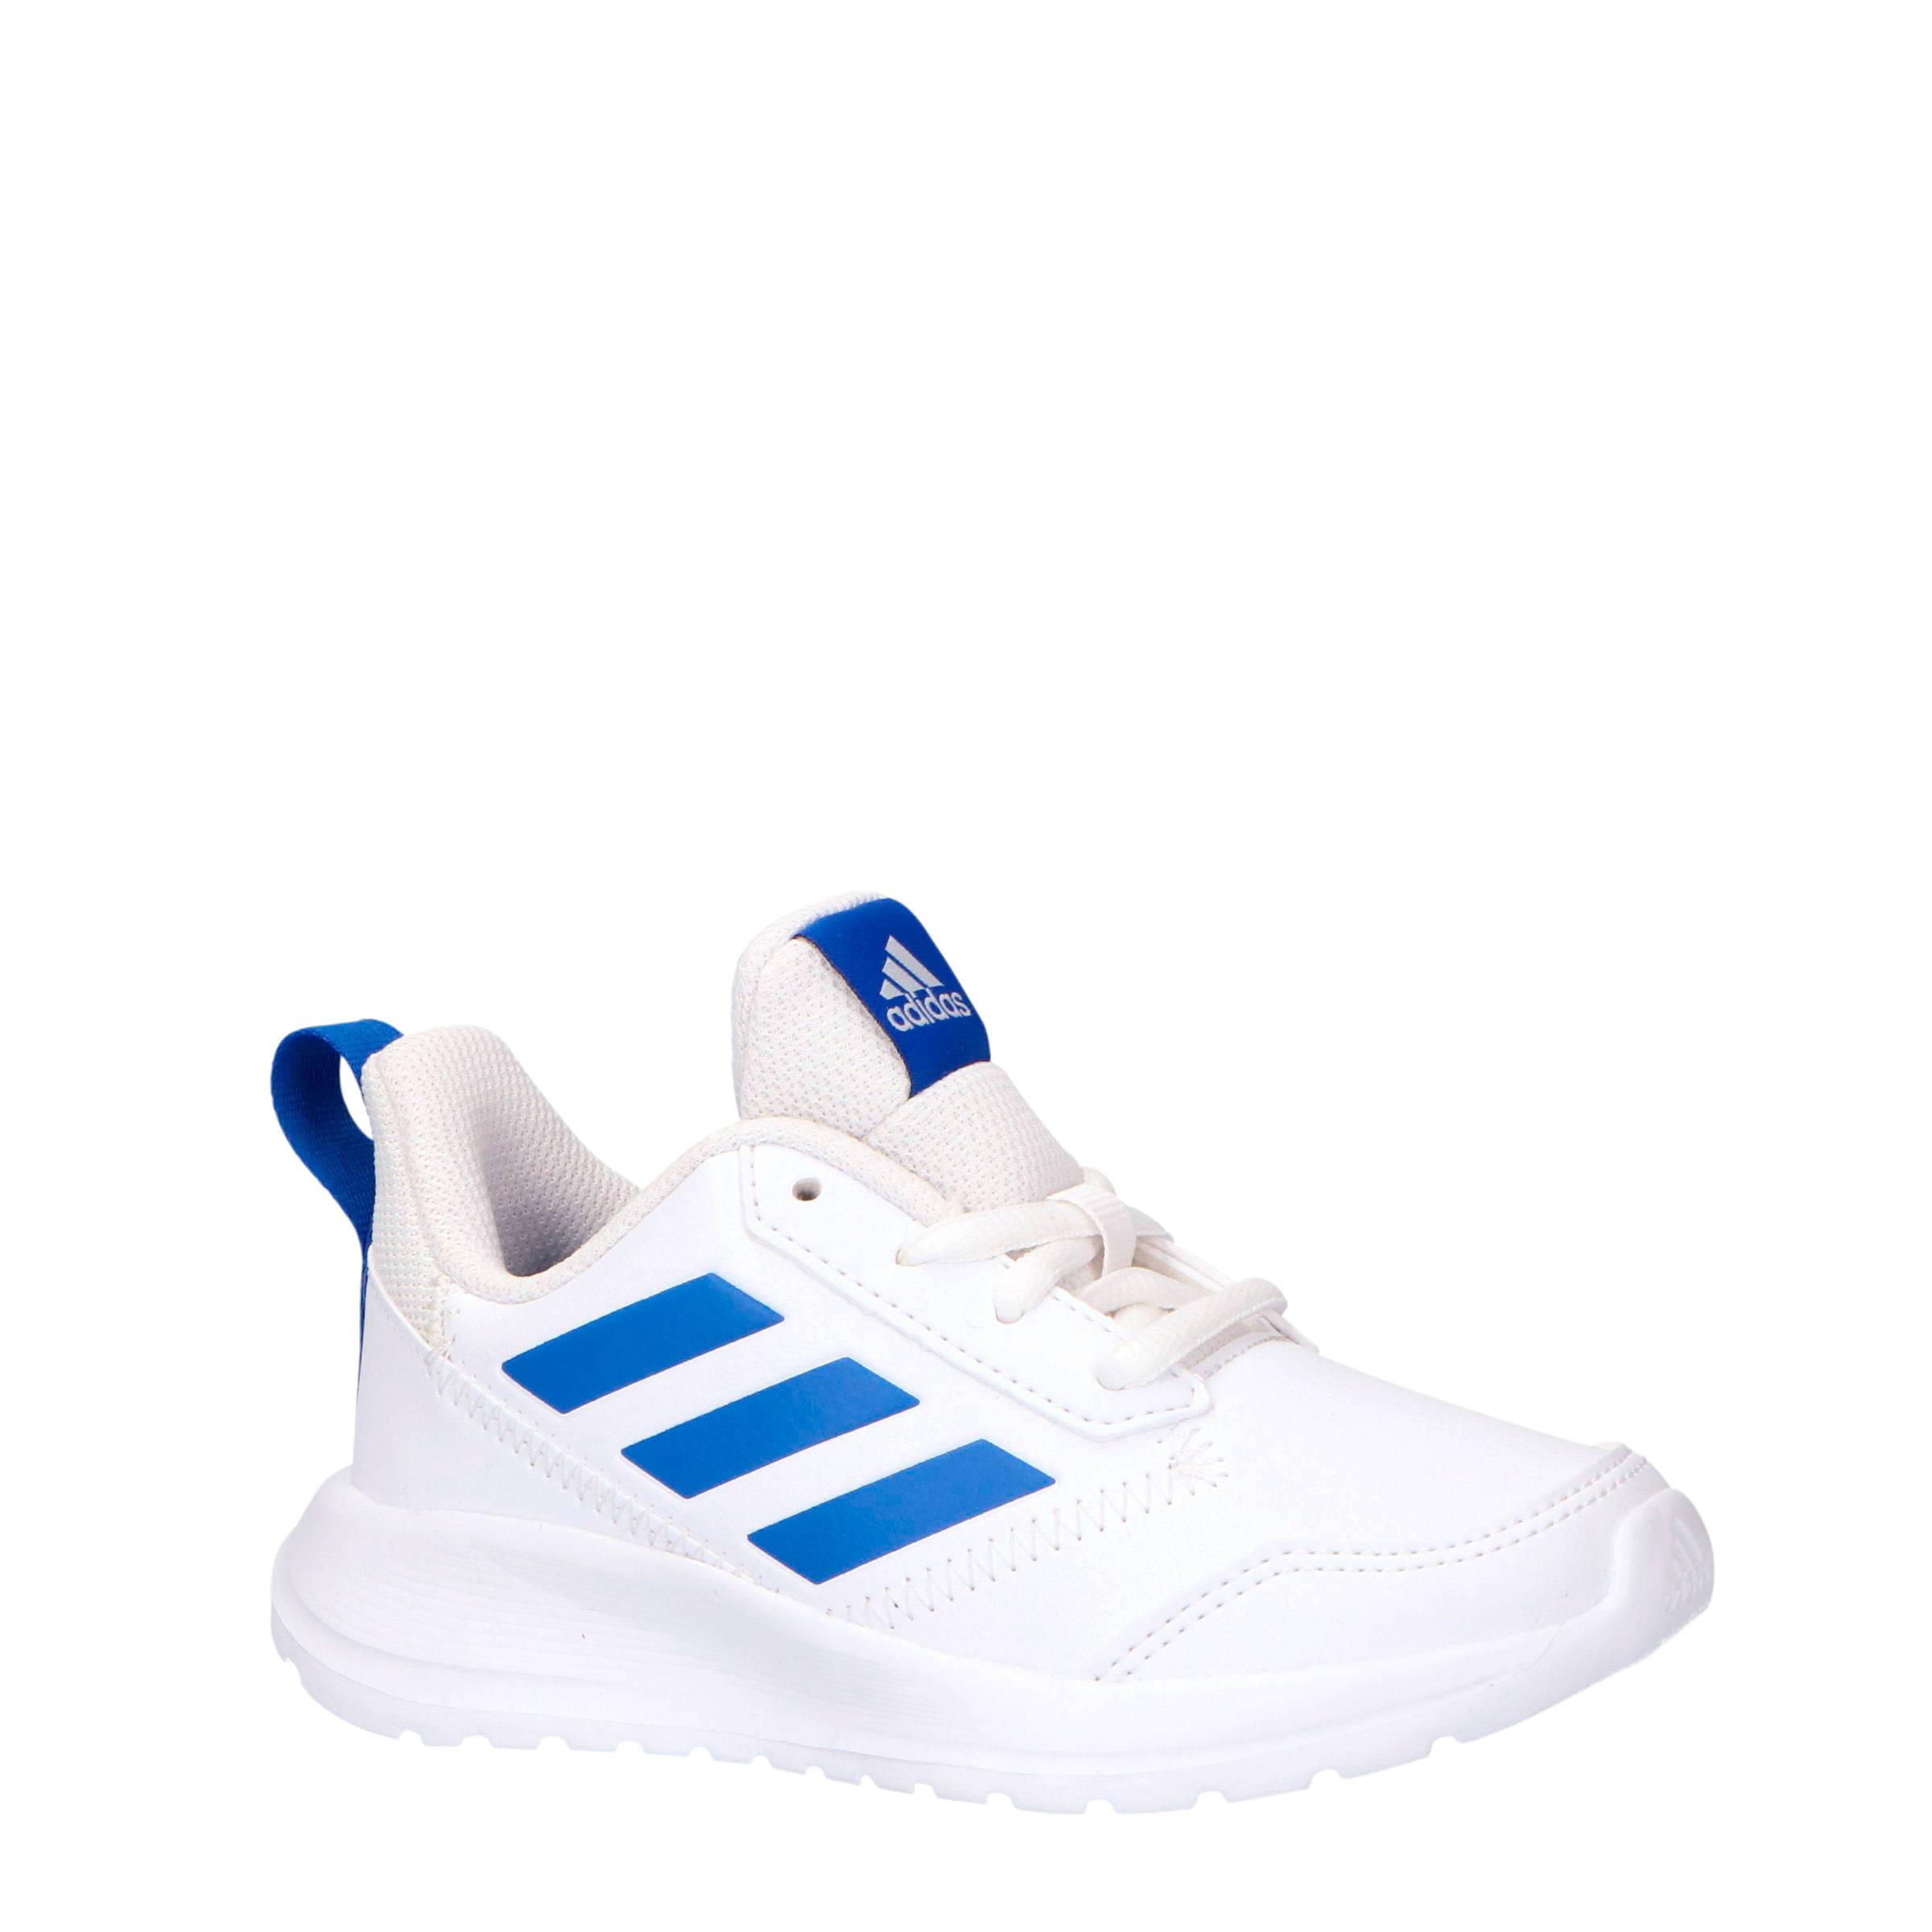 AltaRun K sportschoenen witblauw